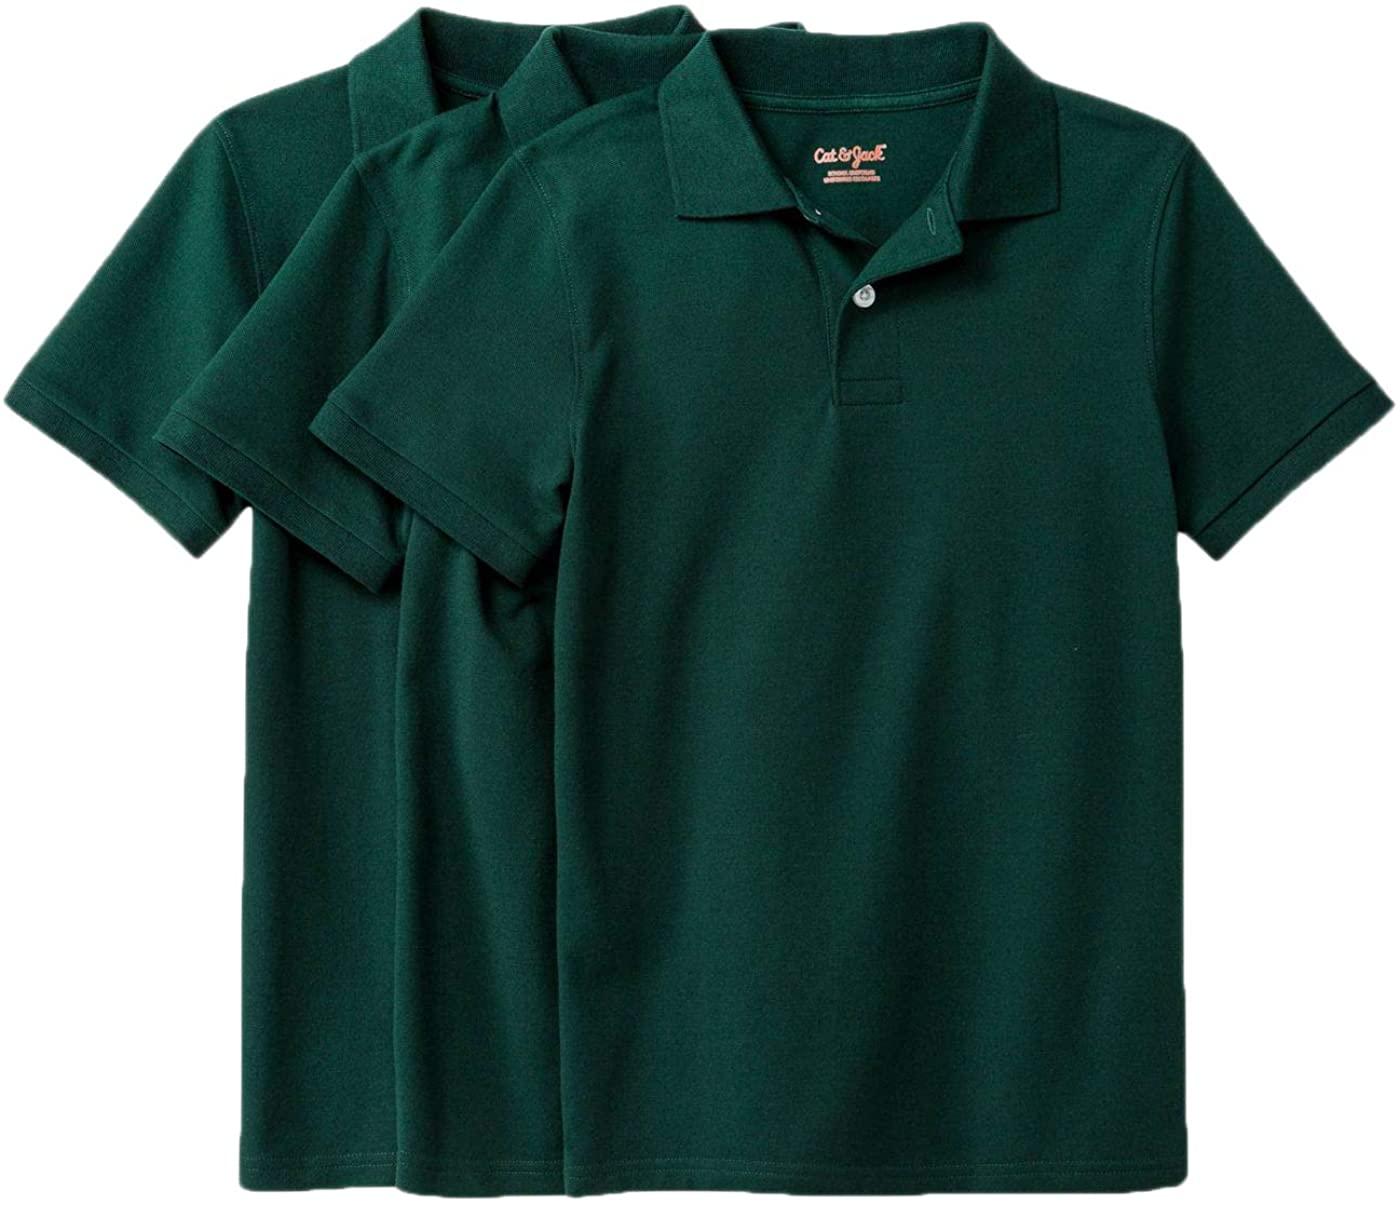 Cat & Jack Boys' Short Sleeve Pique Uniform Polo Shirt